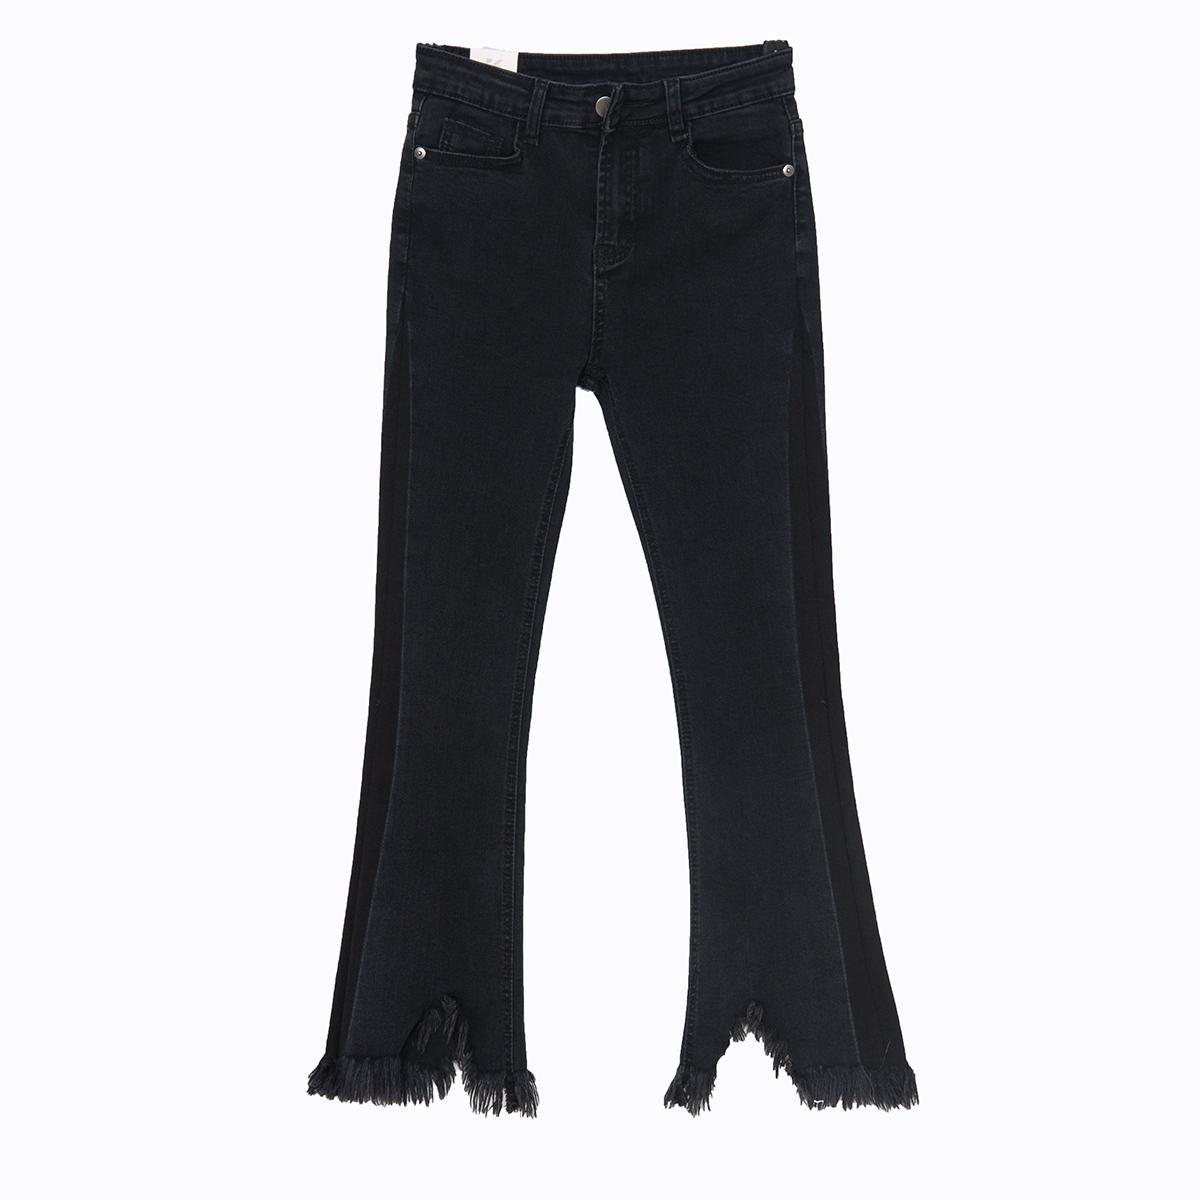 ... Flash Sale Korea perempuan warna mantra yang tidak teratur tanduk celana panjang pinggang tinggi celana jeans